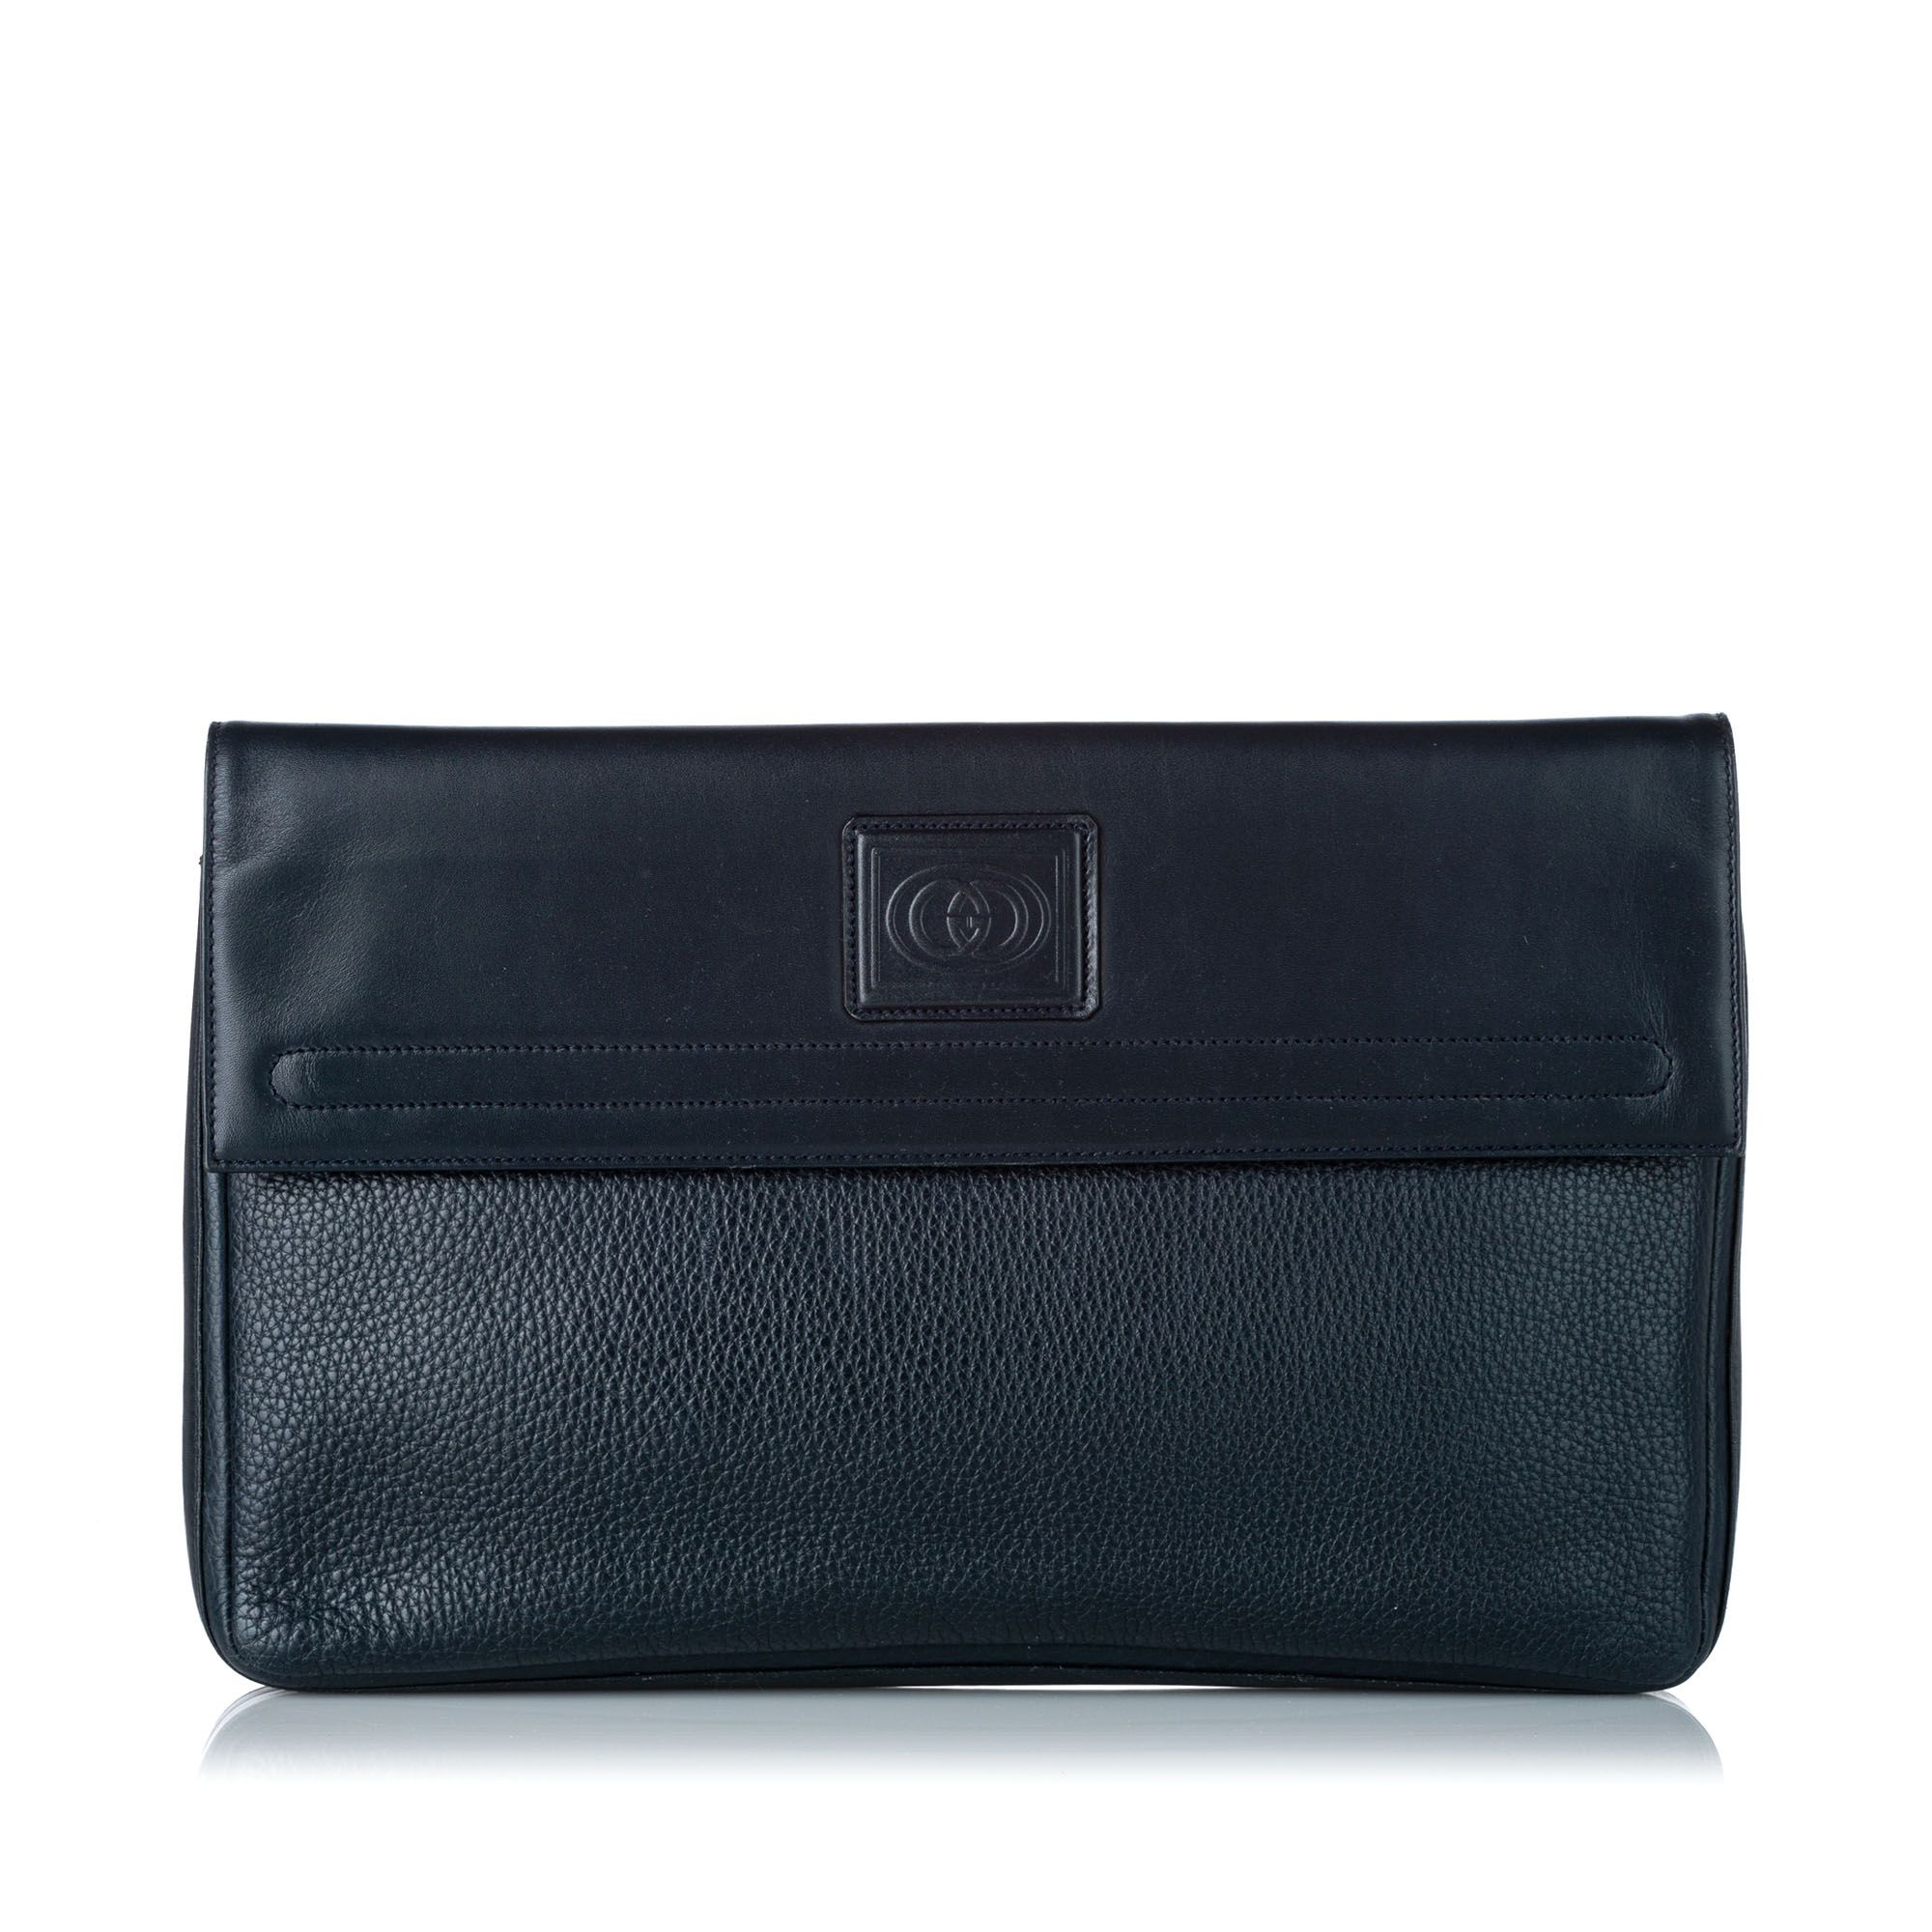 Vintage Gucci Leather Clutch Bag Blue